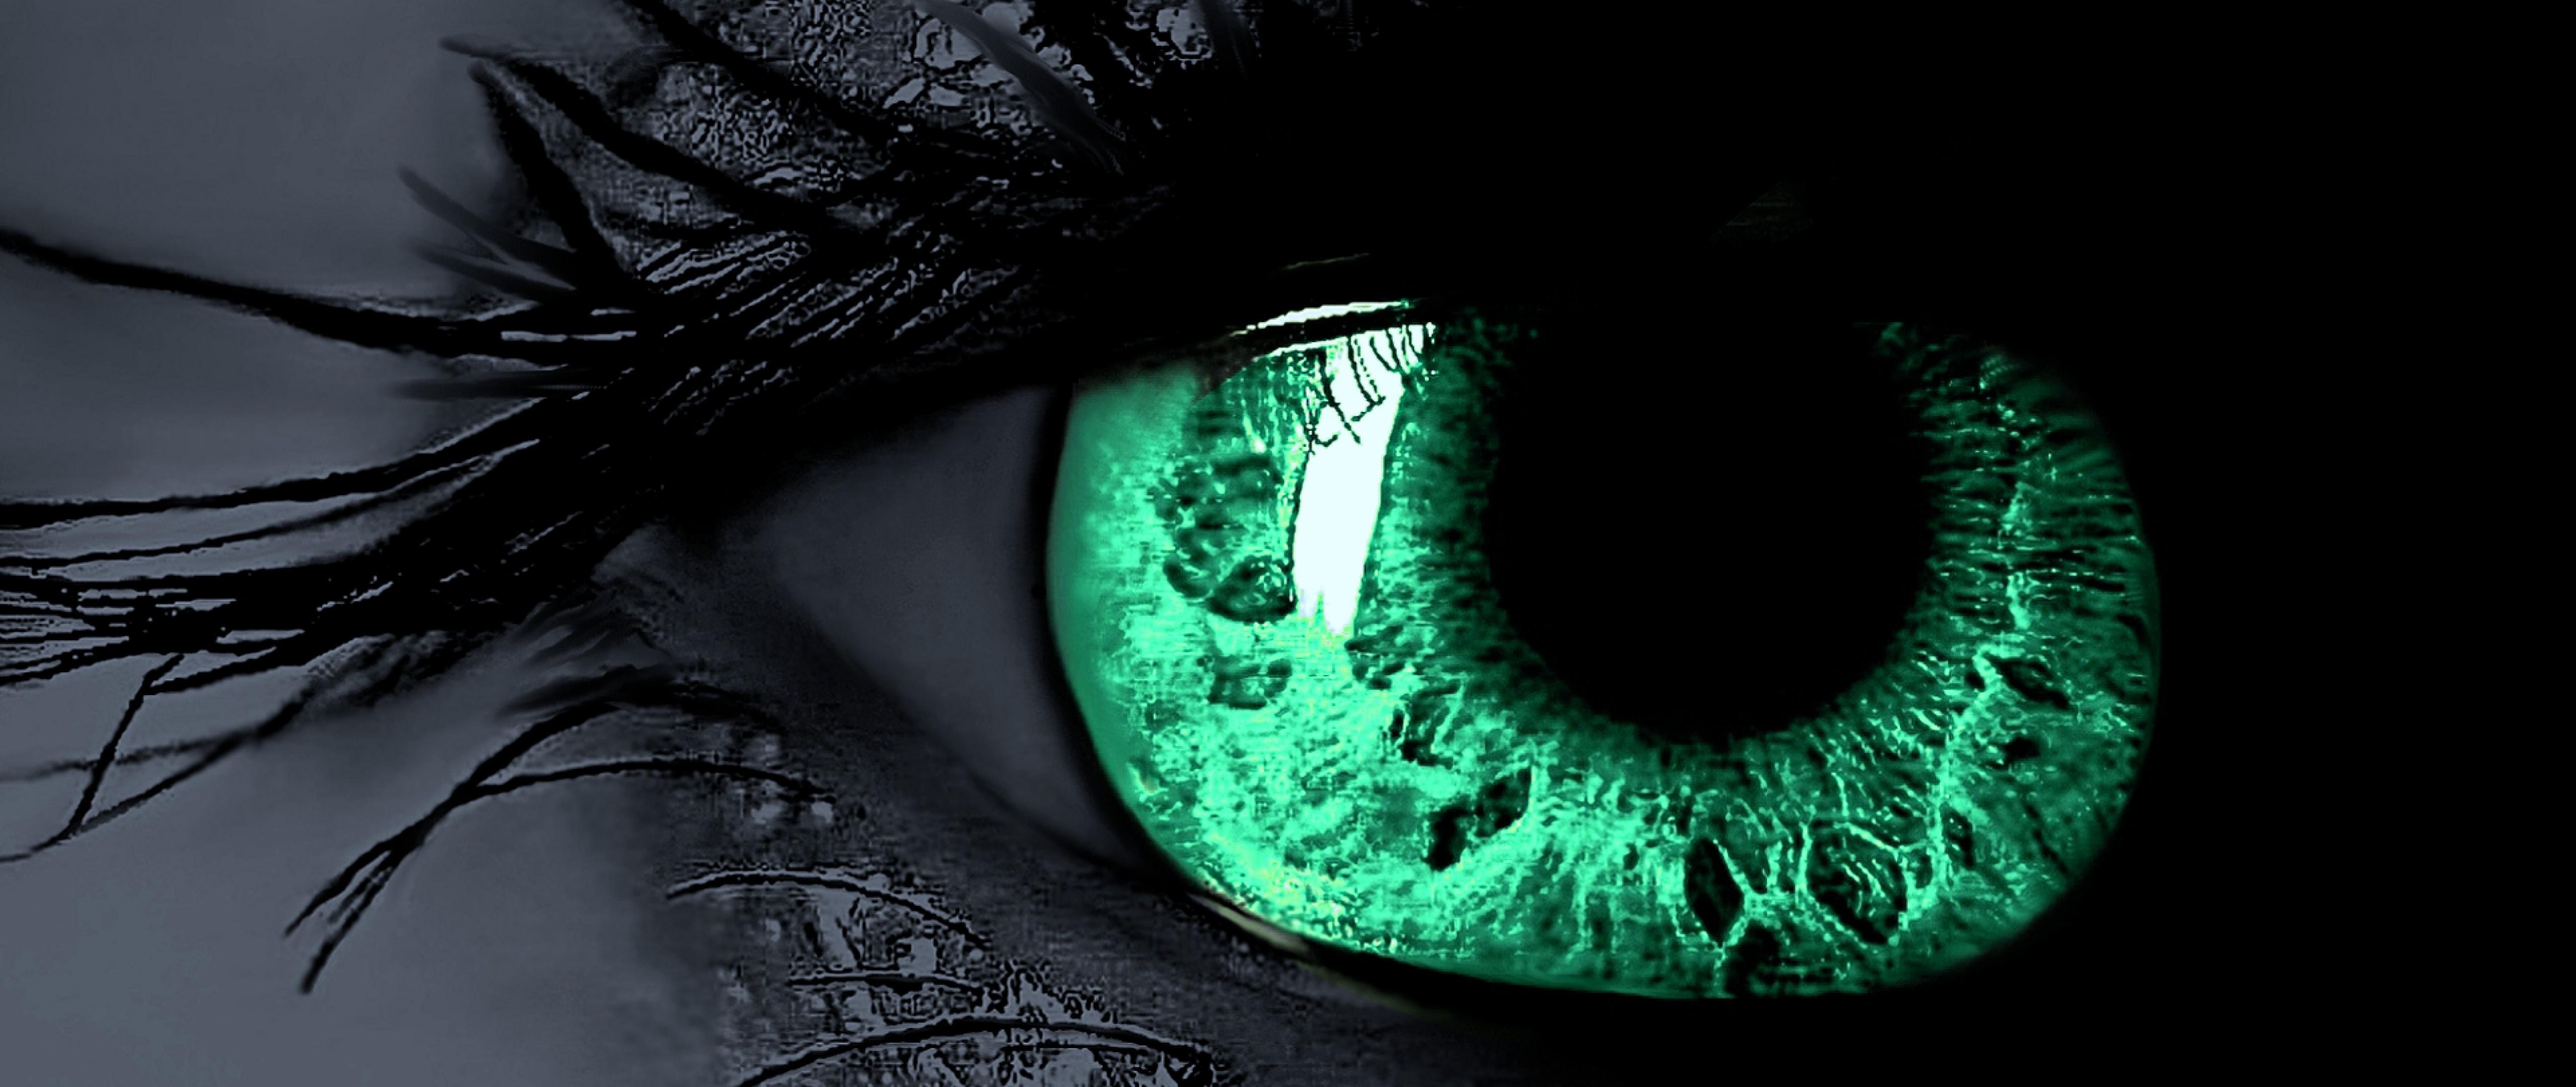 Music 4k Hd Desktop Wallpaper For 4k Ultra Hd Tv Wide: Green Eyes Beautiful Hd Wallpaper For Desktop And Mobiles